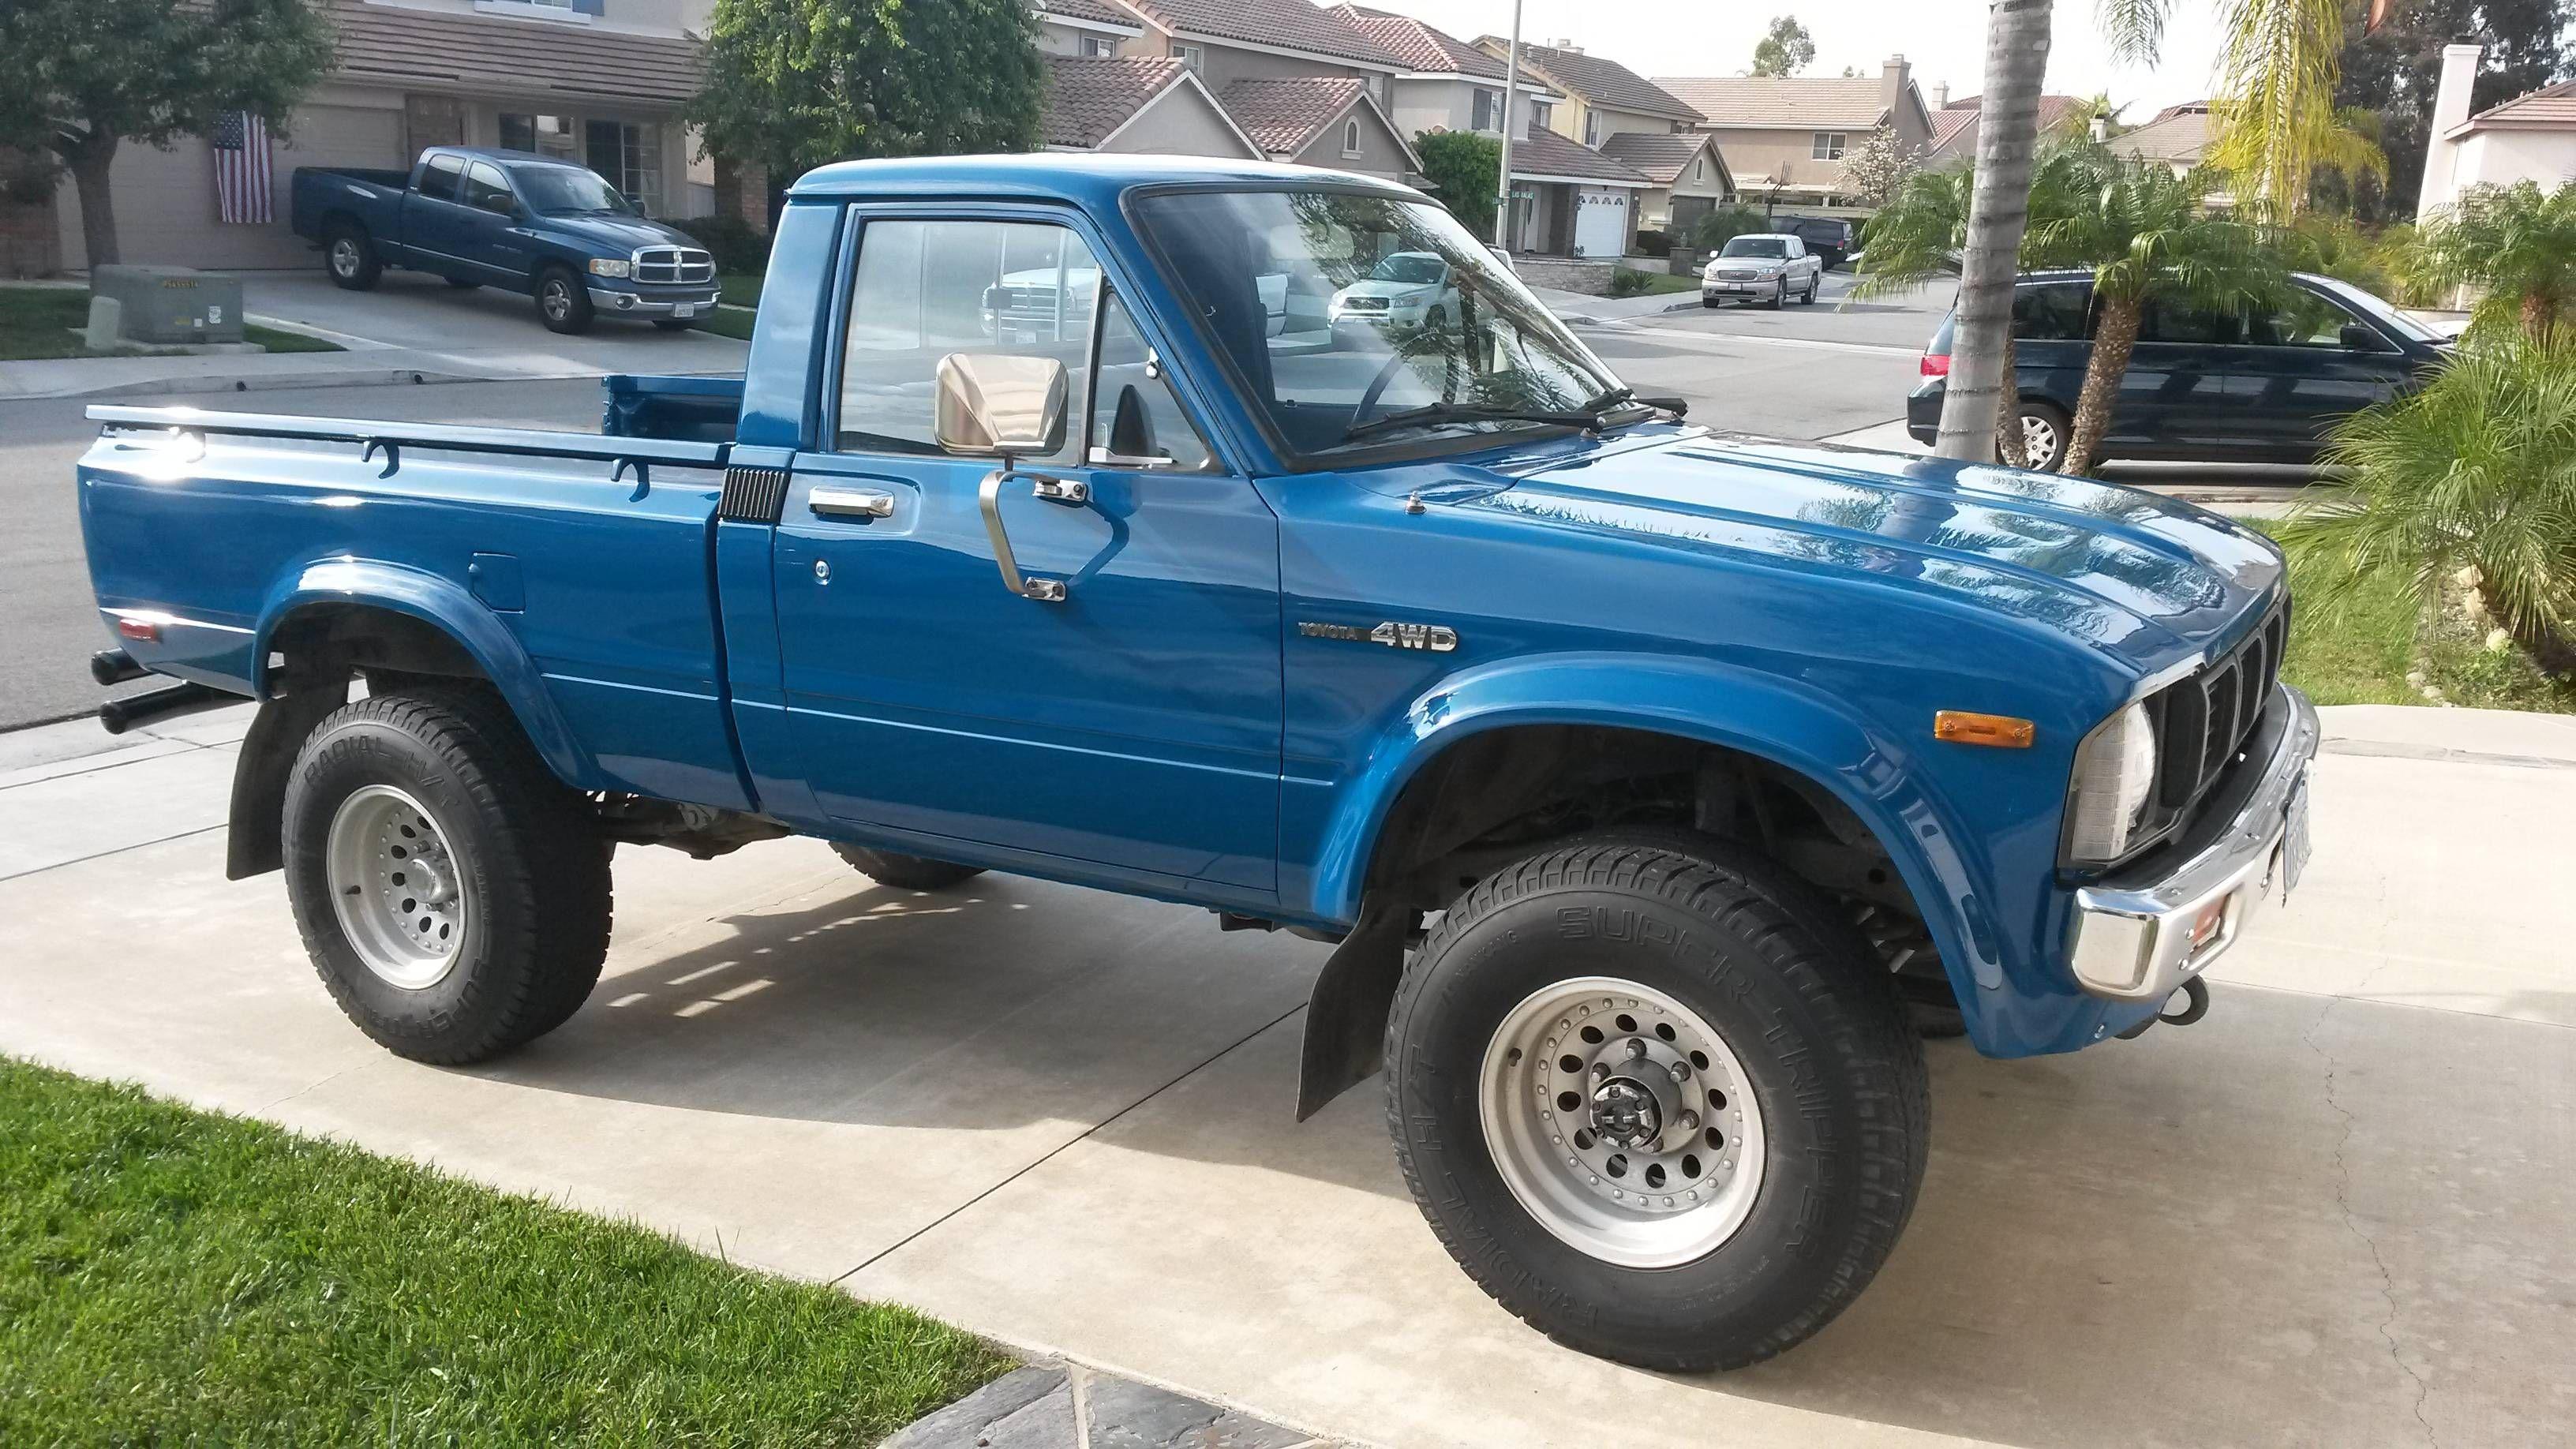 1980 Toyota Pickup 4WD Classic trucks, Antique trucks